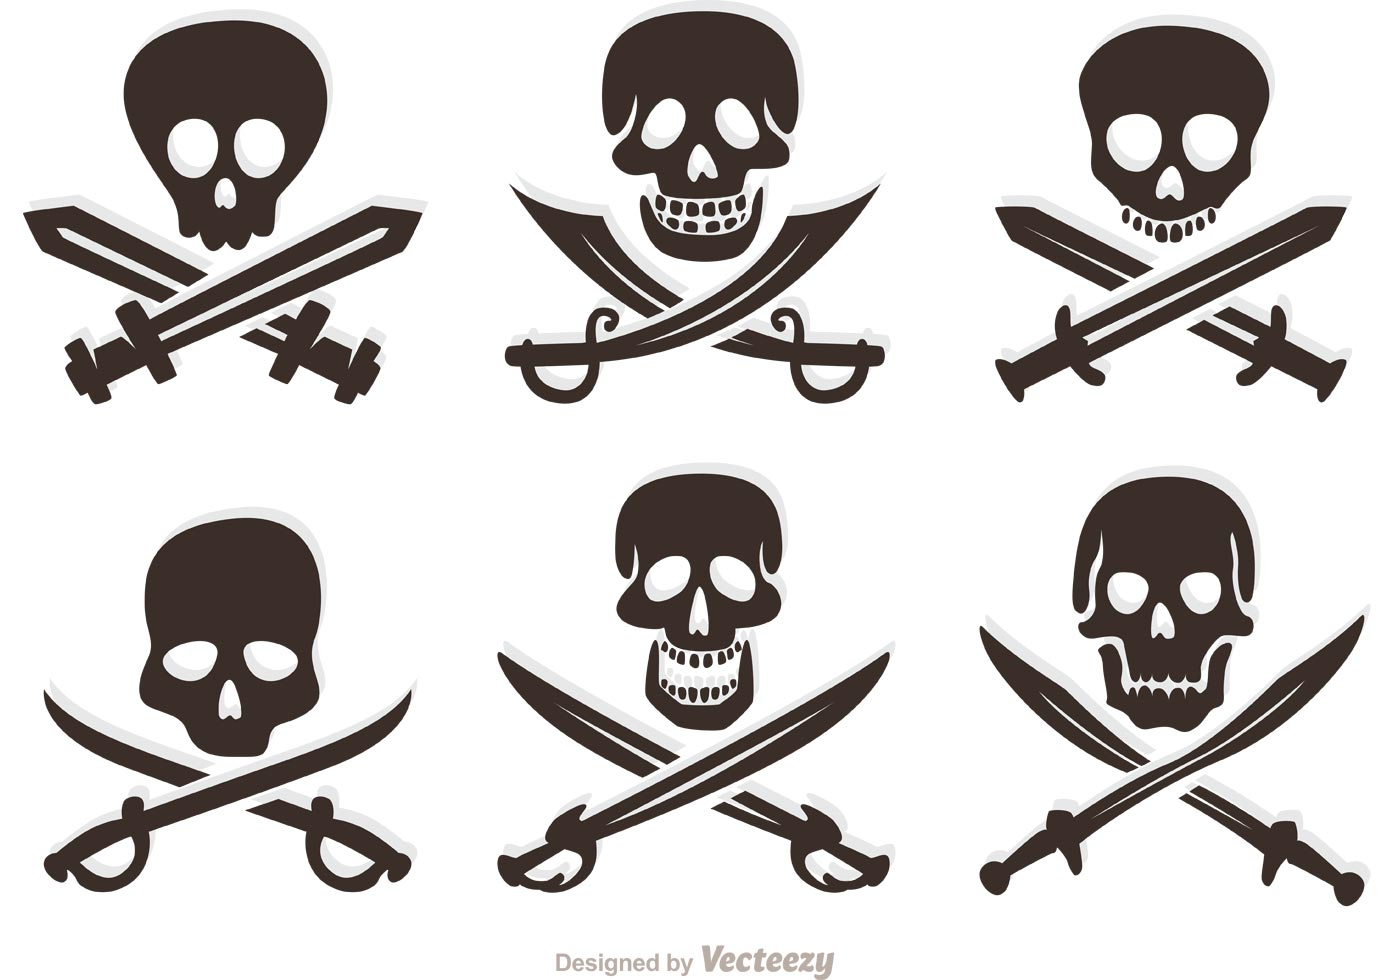 Pirate Skull Cross Bones Free Vector Art 561 Free Downloads